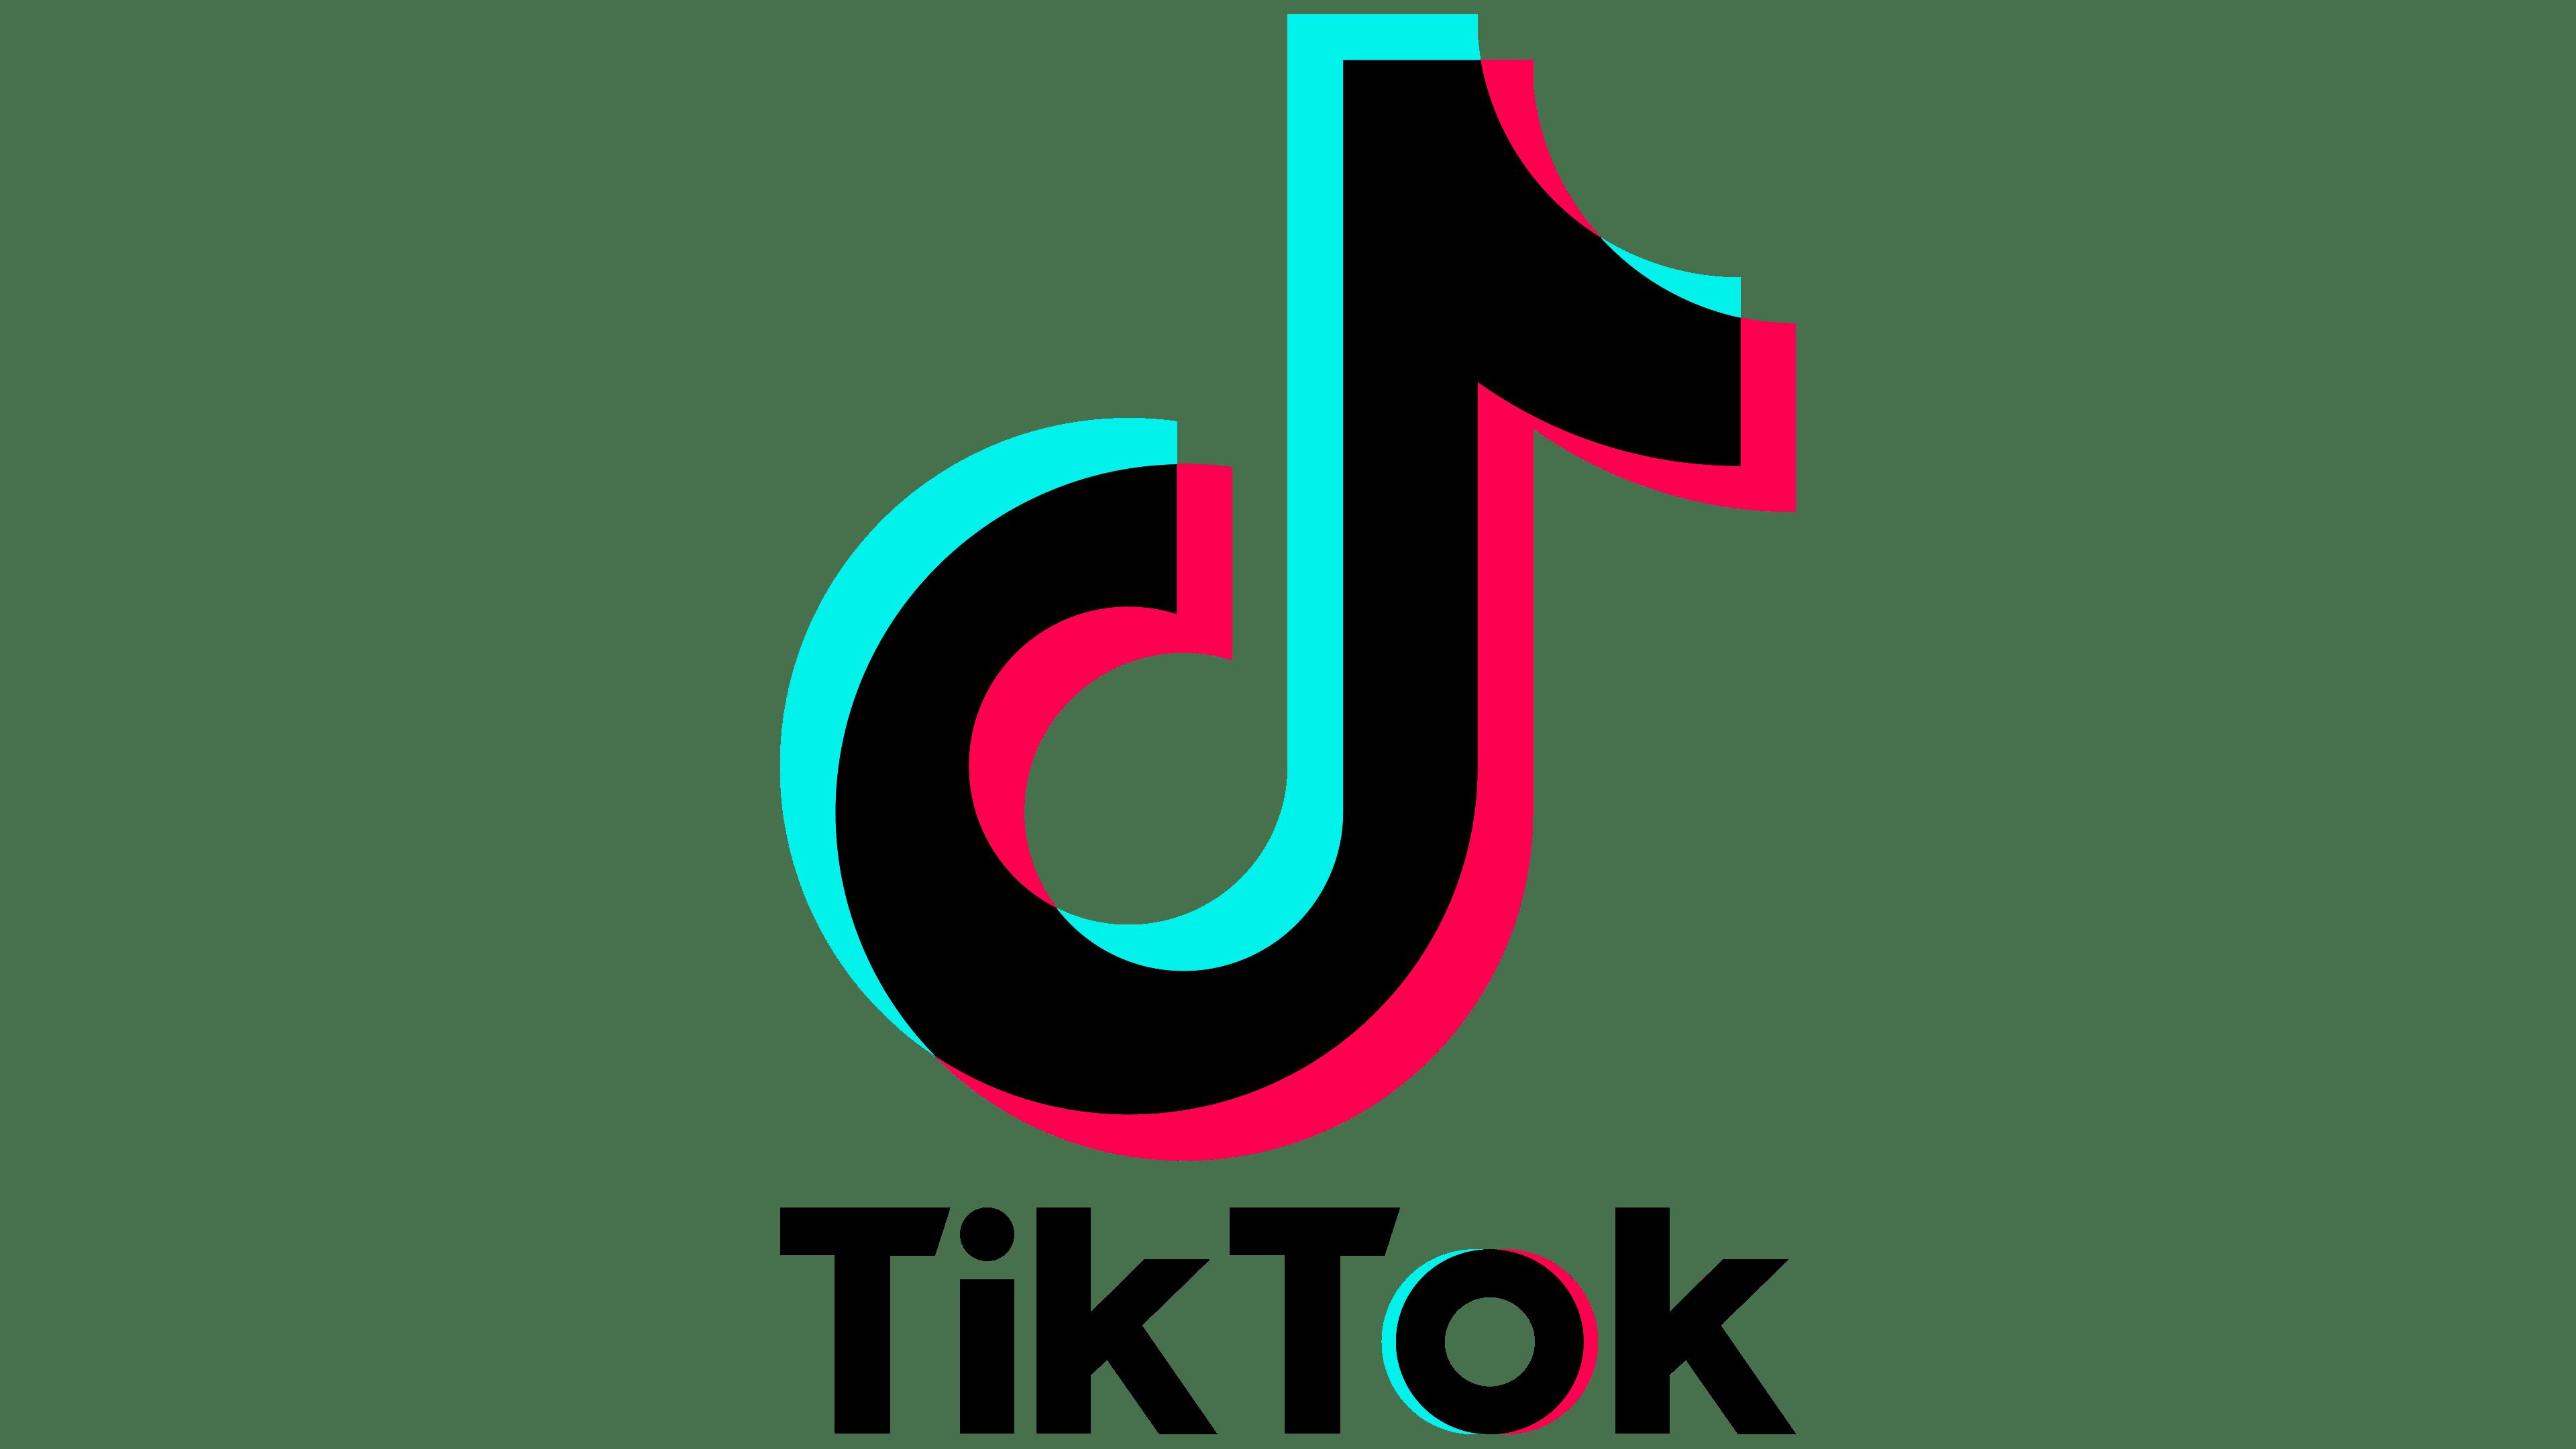 TikTok logo - Tik Tok Dancing